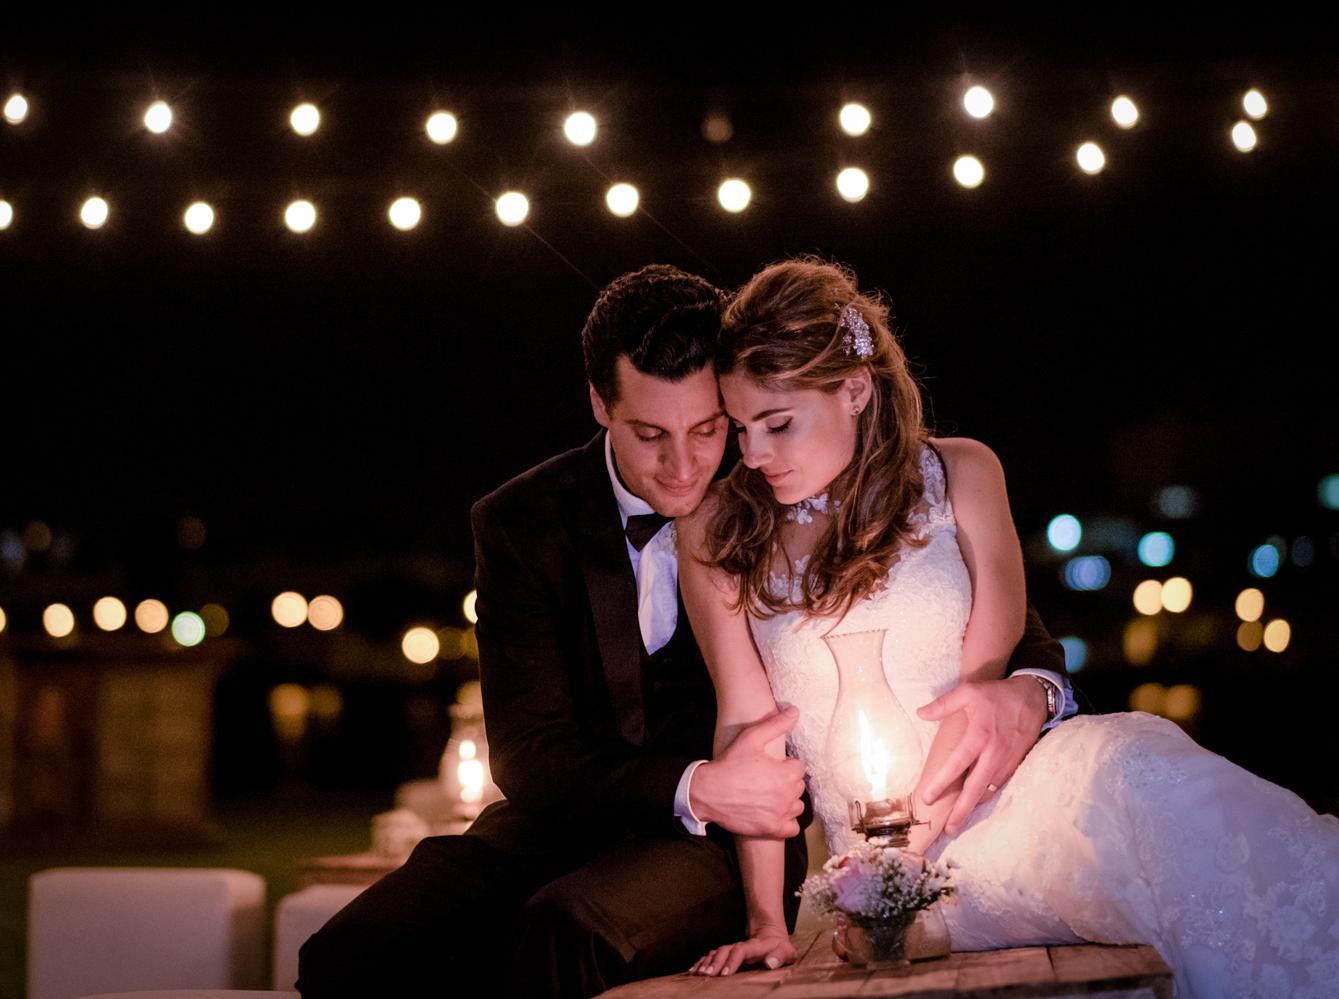 bodas-sin-clasificar-sin-tema-cuba-27832.jpg